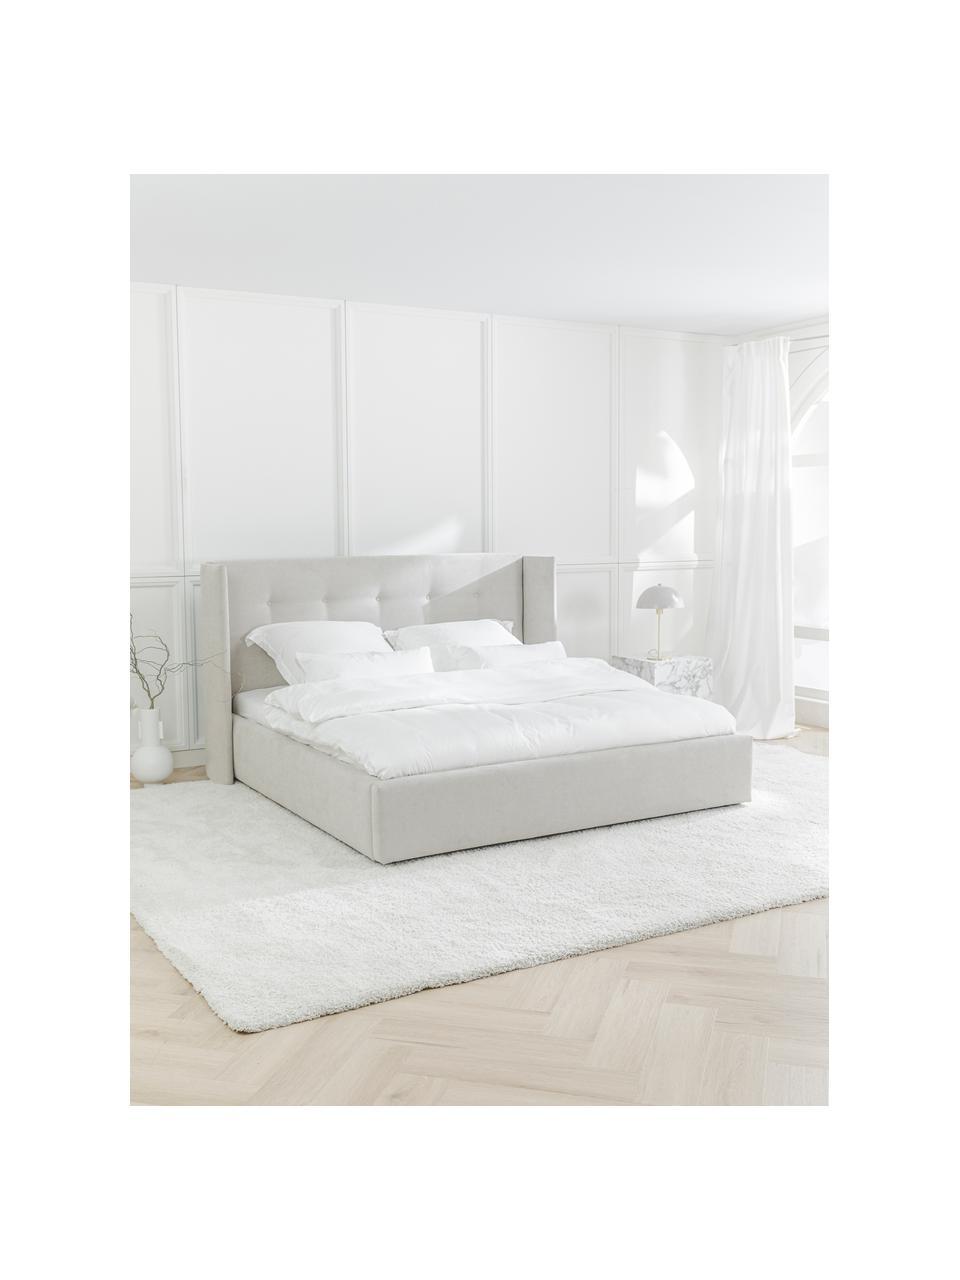 Gestoffeerd bed Star in beige, Frame: massief grenenhout en pla, Bekleding: polyester (gestructureerd, Geweven stof beige, 160 x 200 cm